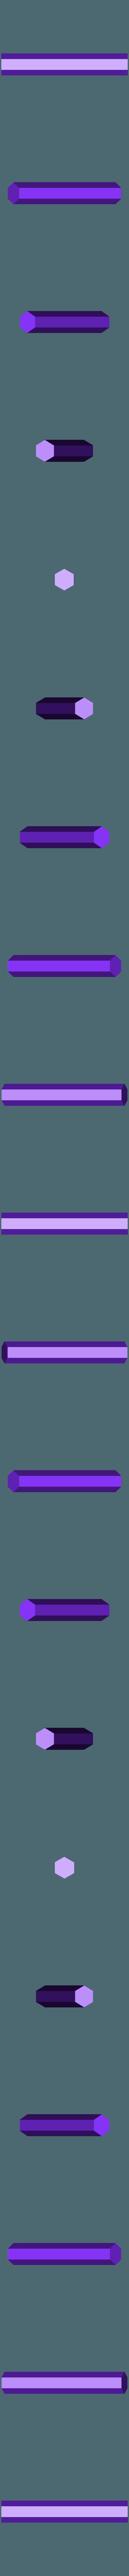 Axle.stl Download free STL file Windup Bunny • 3D printing design, gzumwalt